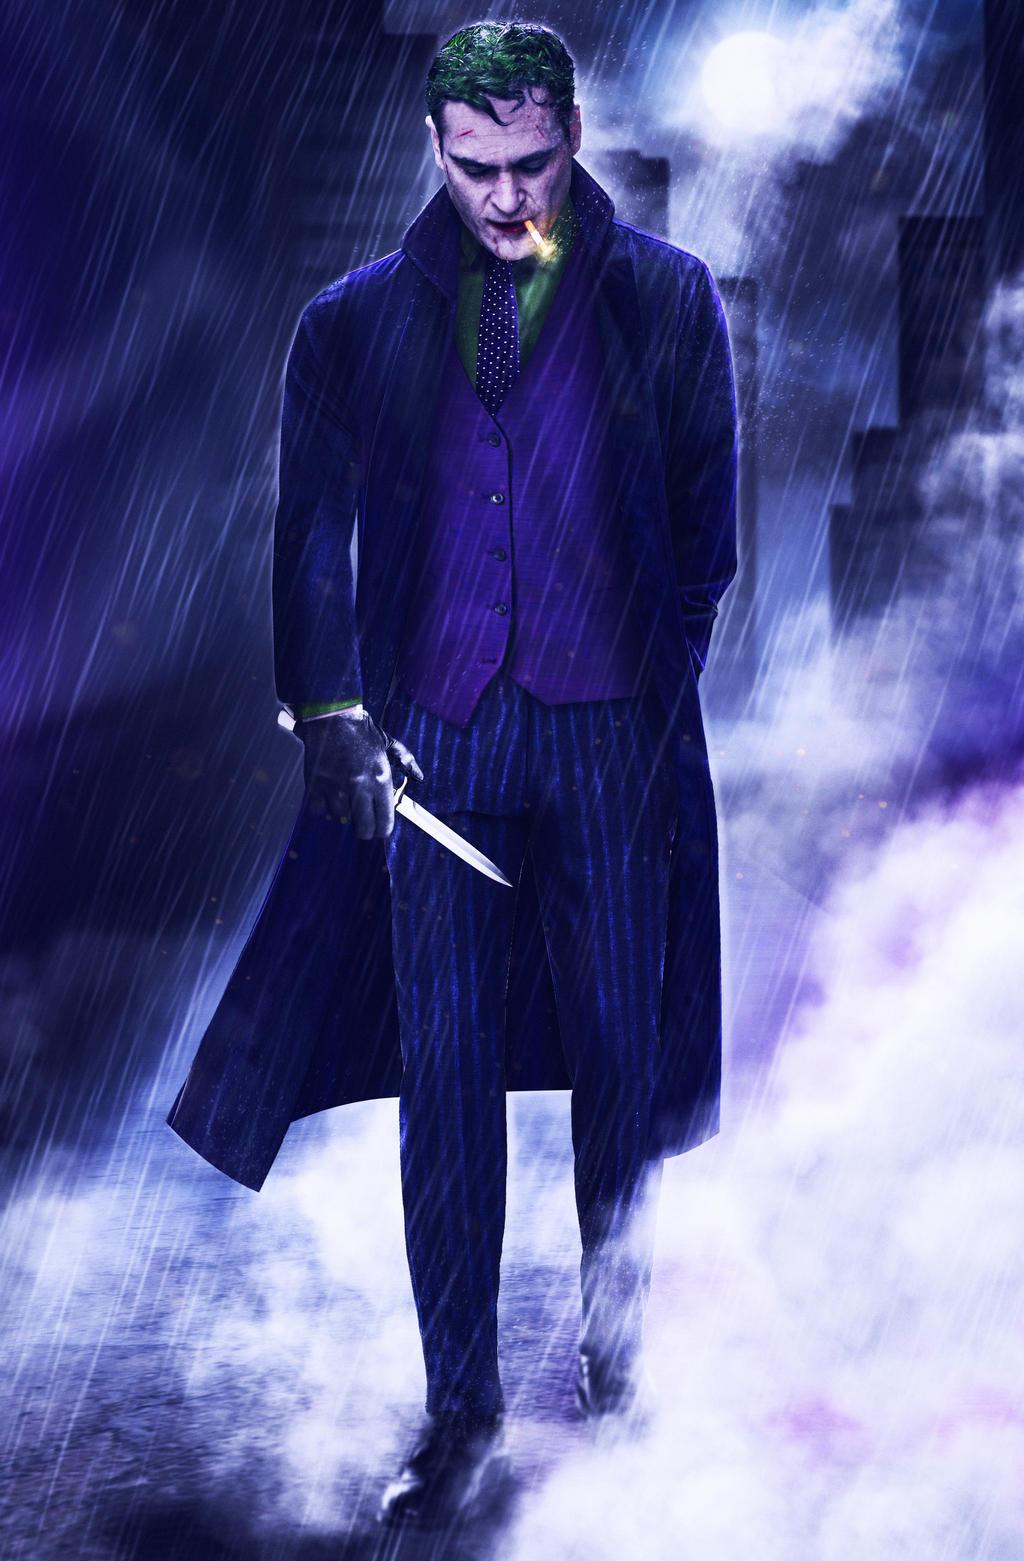 Joaquin Phoenix Joker 2019 Film By Digestingbat On Deviantart